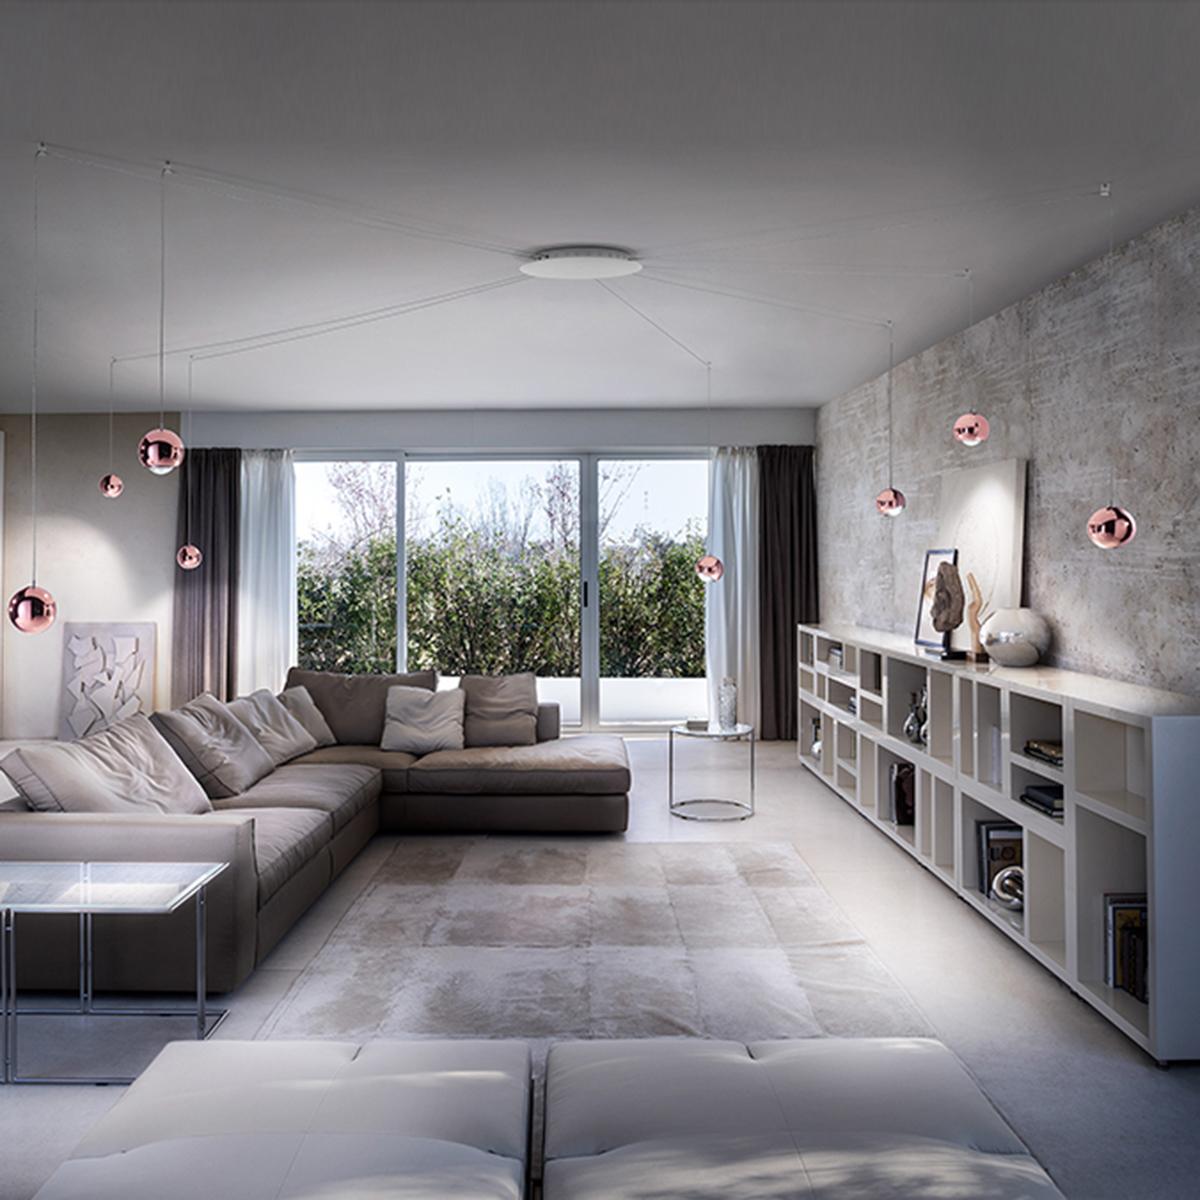 studio italia design spider pendelleuchte 8 flg. Black Bedroom Furniture Sets. Home Design Ideas